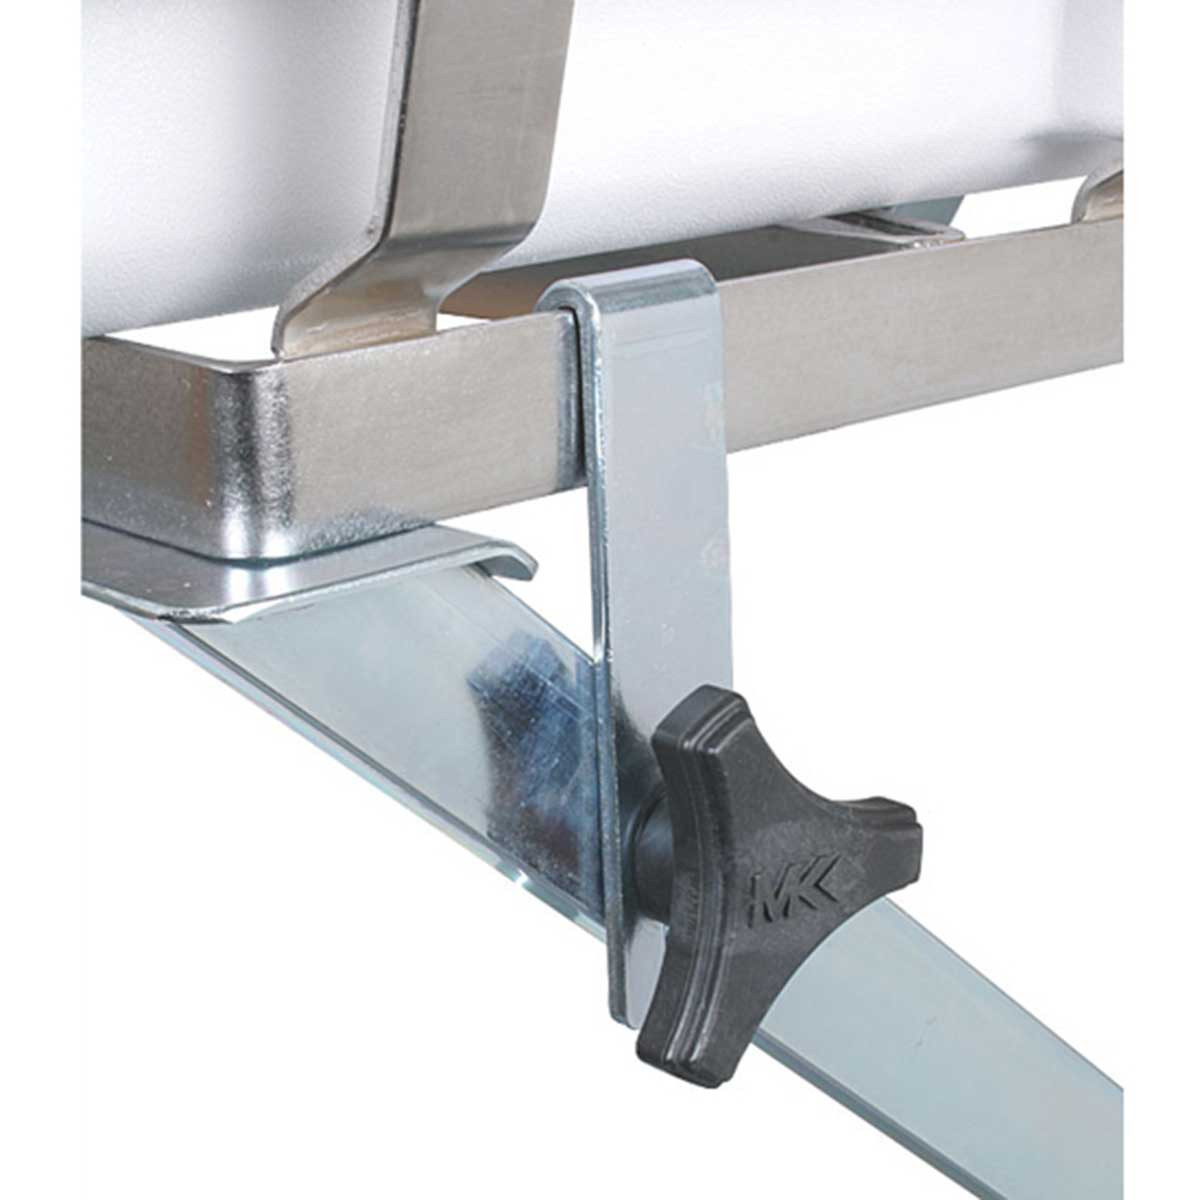 MK Tile Saw folding stand locking mechanism